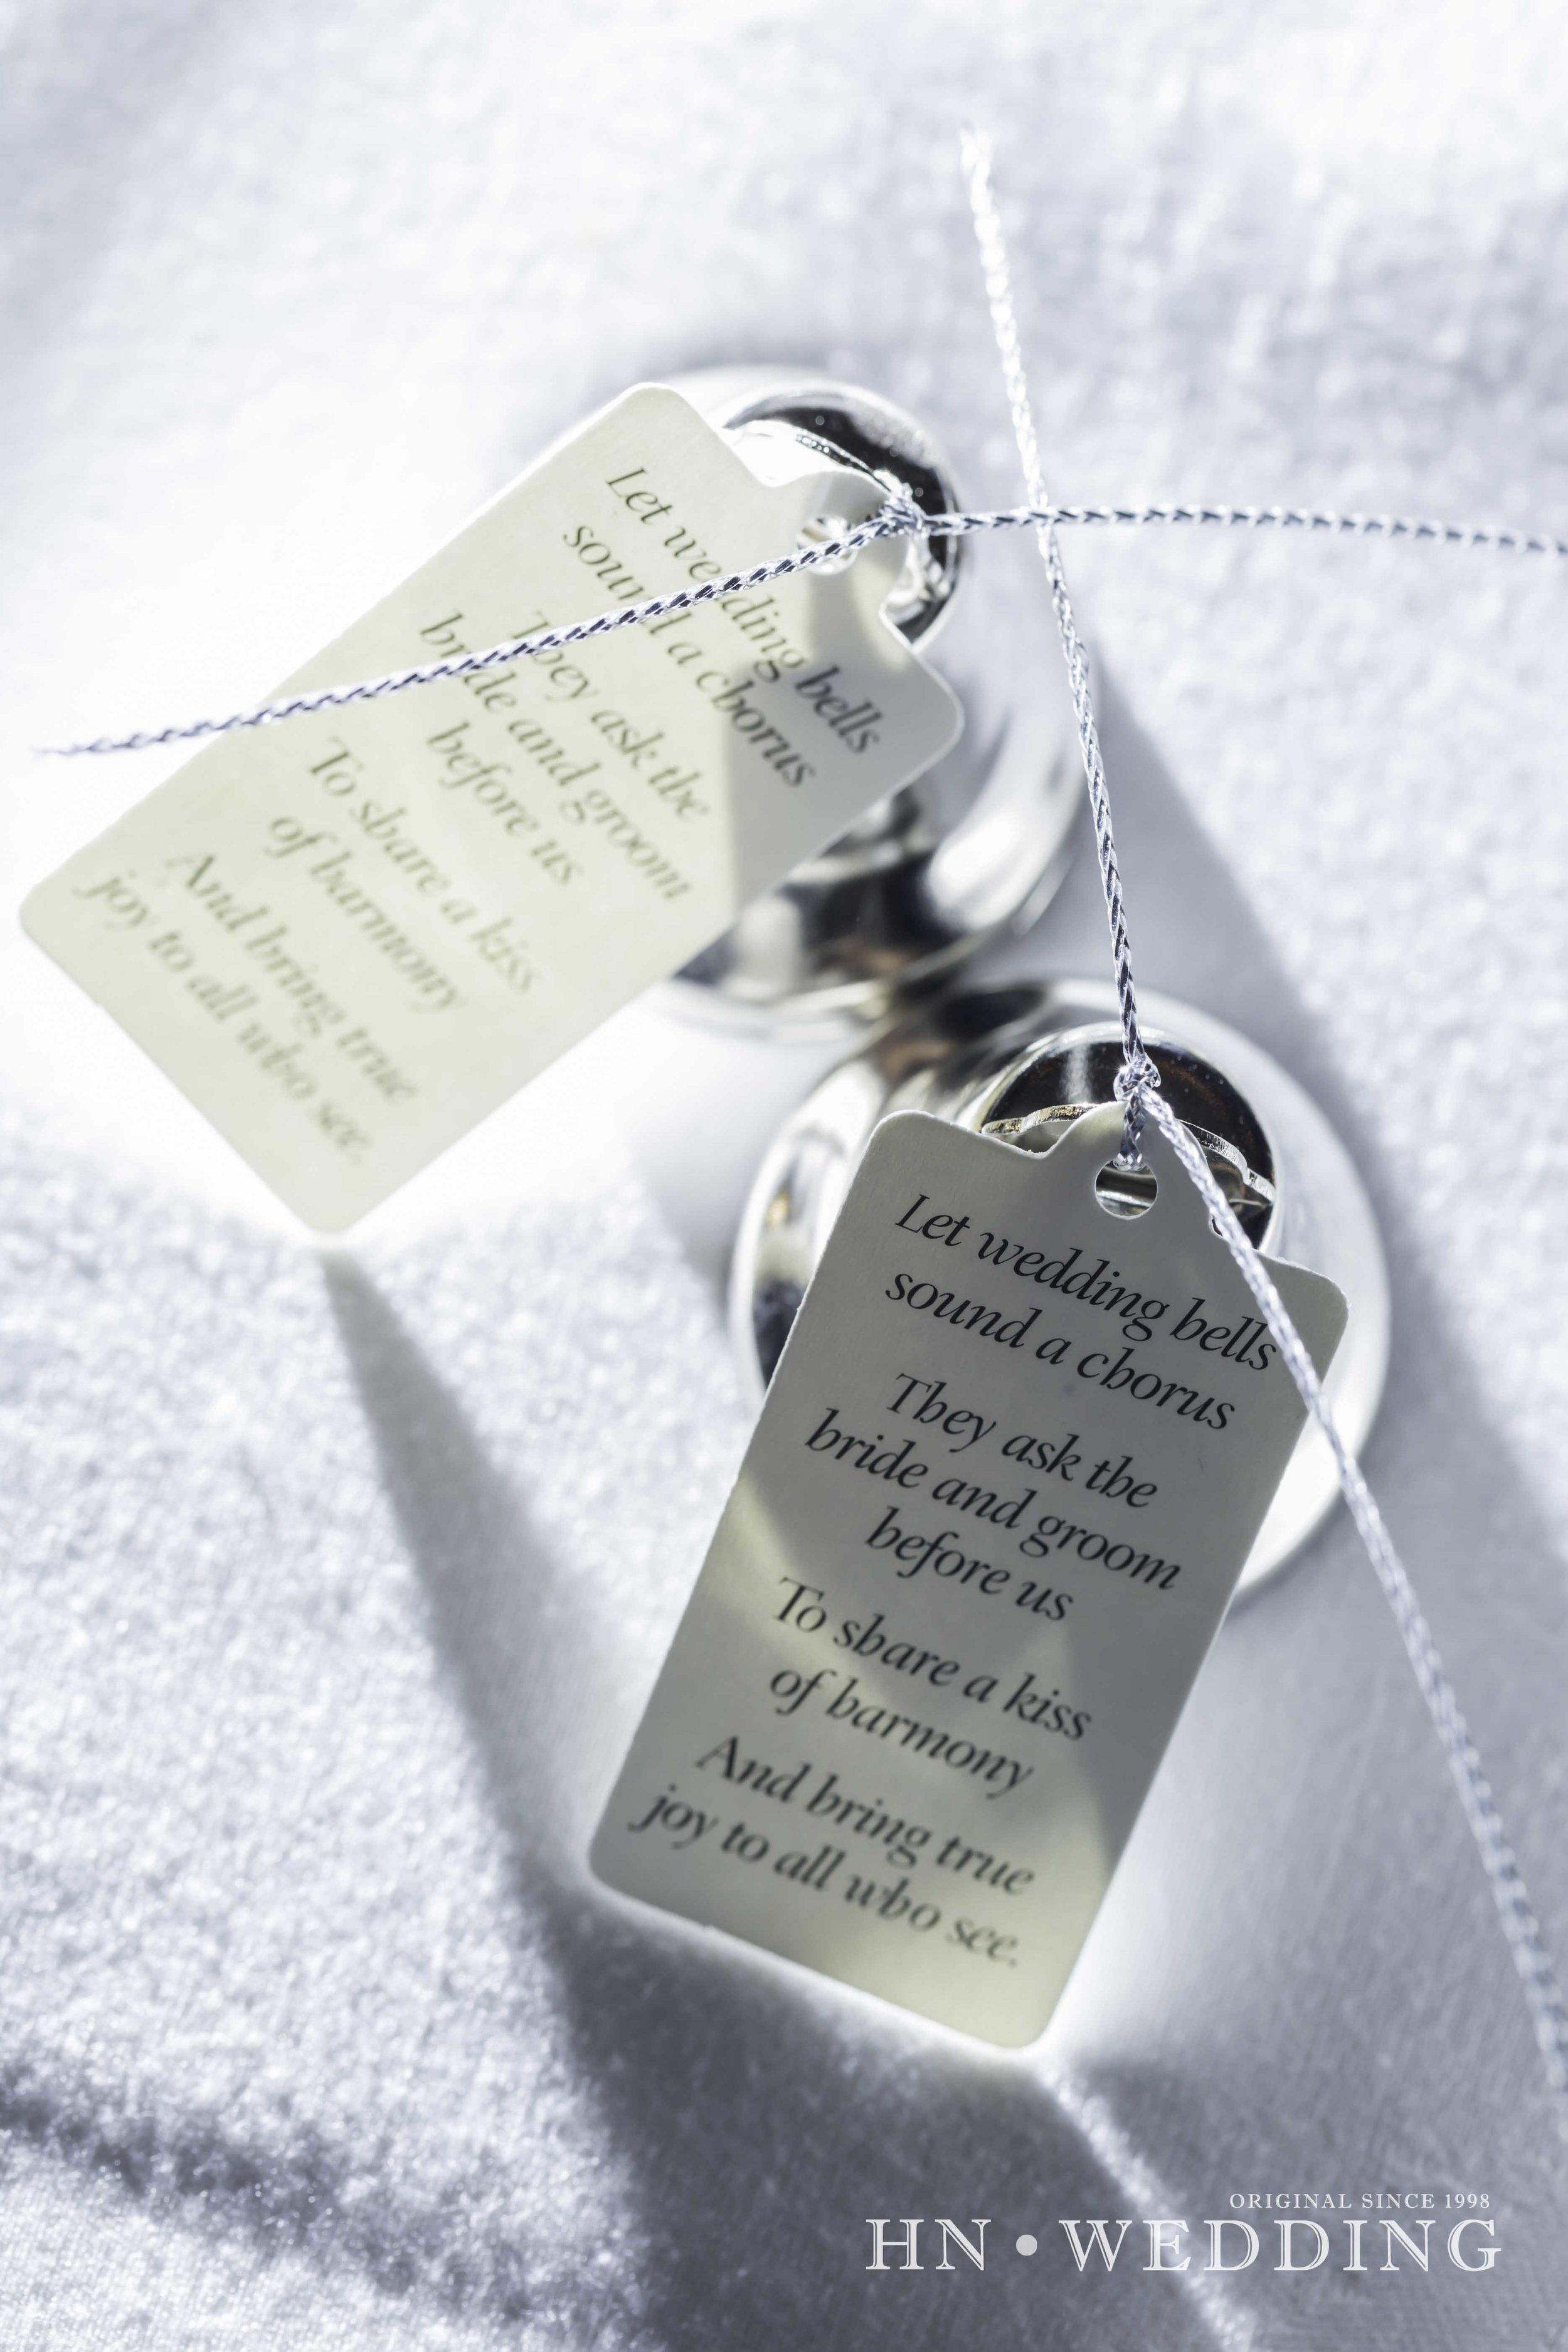 HNwedding-20161012-wedding-4284.jpg